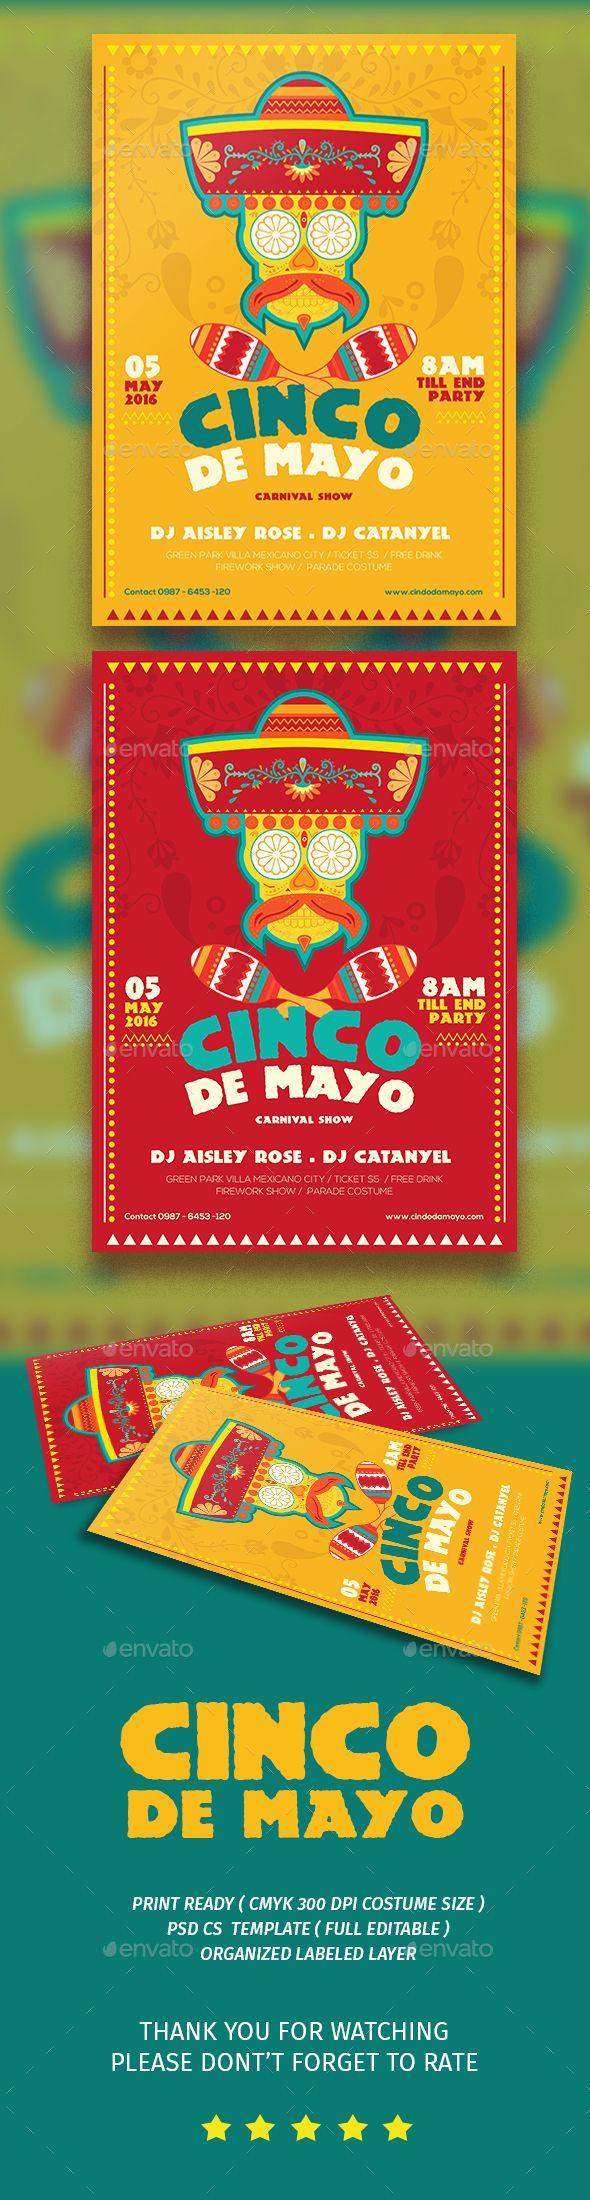 Cinco De Mayo Flyer Template PSD. Download here: http://graphicriver.net/item/cinco-de-mayo-flyer/15797285?ref=ksioks